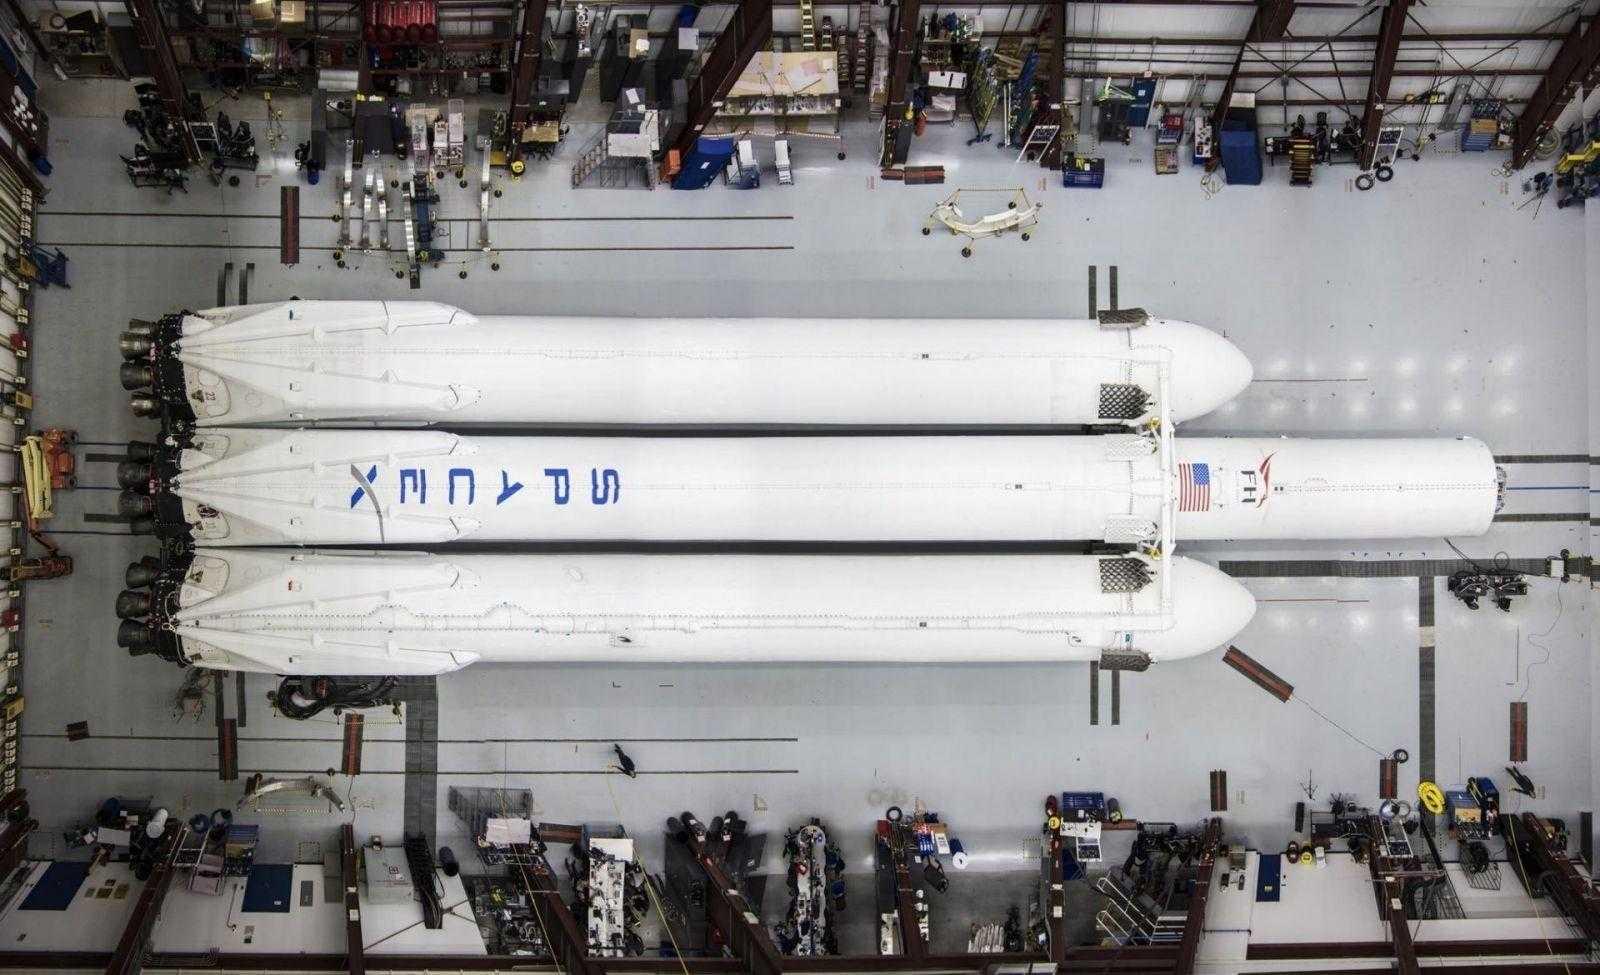 Илон Маск опубликовал фото практически собранной ракеты SpaceX Falcon Heavy (SpaceX Falcon Heavy 2)